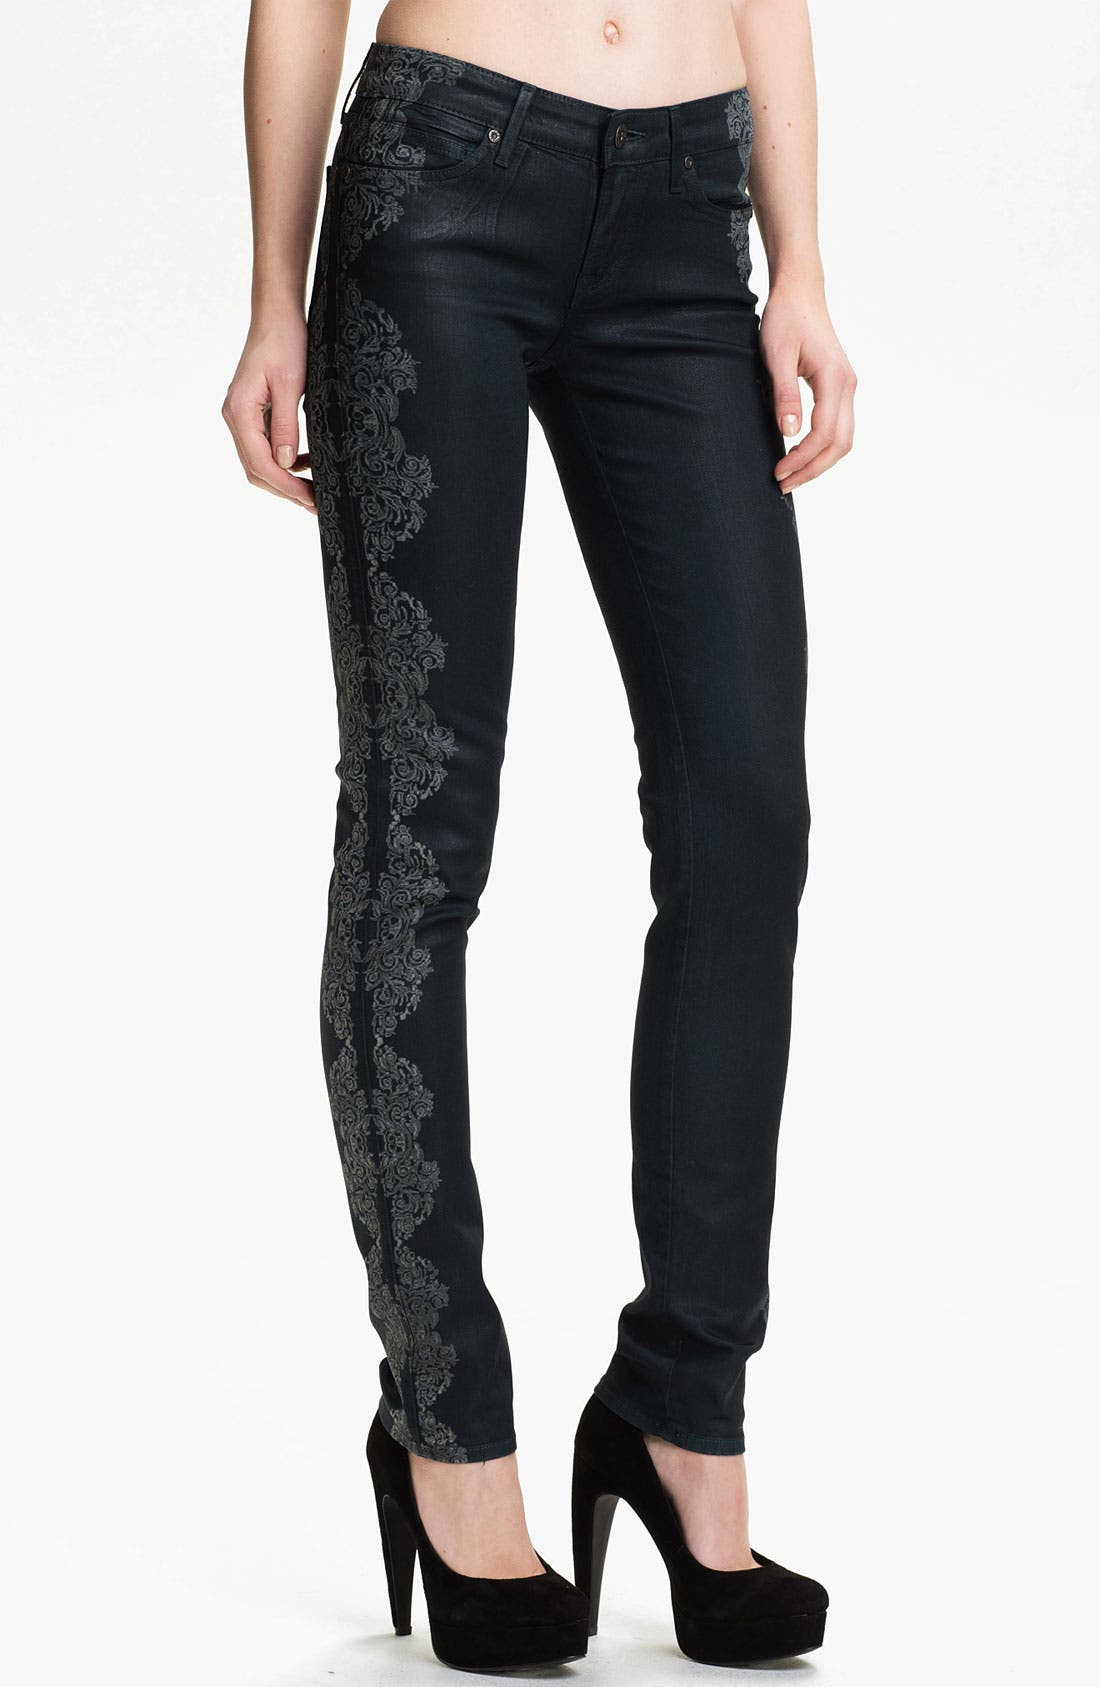 Alternate Image 1 Selected - Rich & Skinny 'Legacy' Coated Skinny Jeans (Temperance)